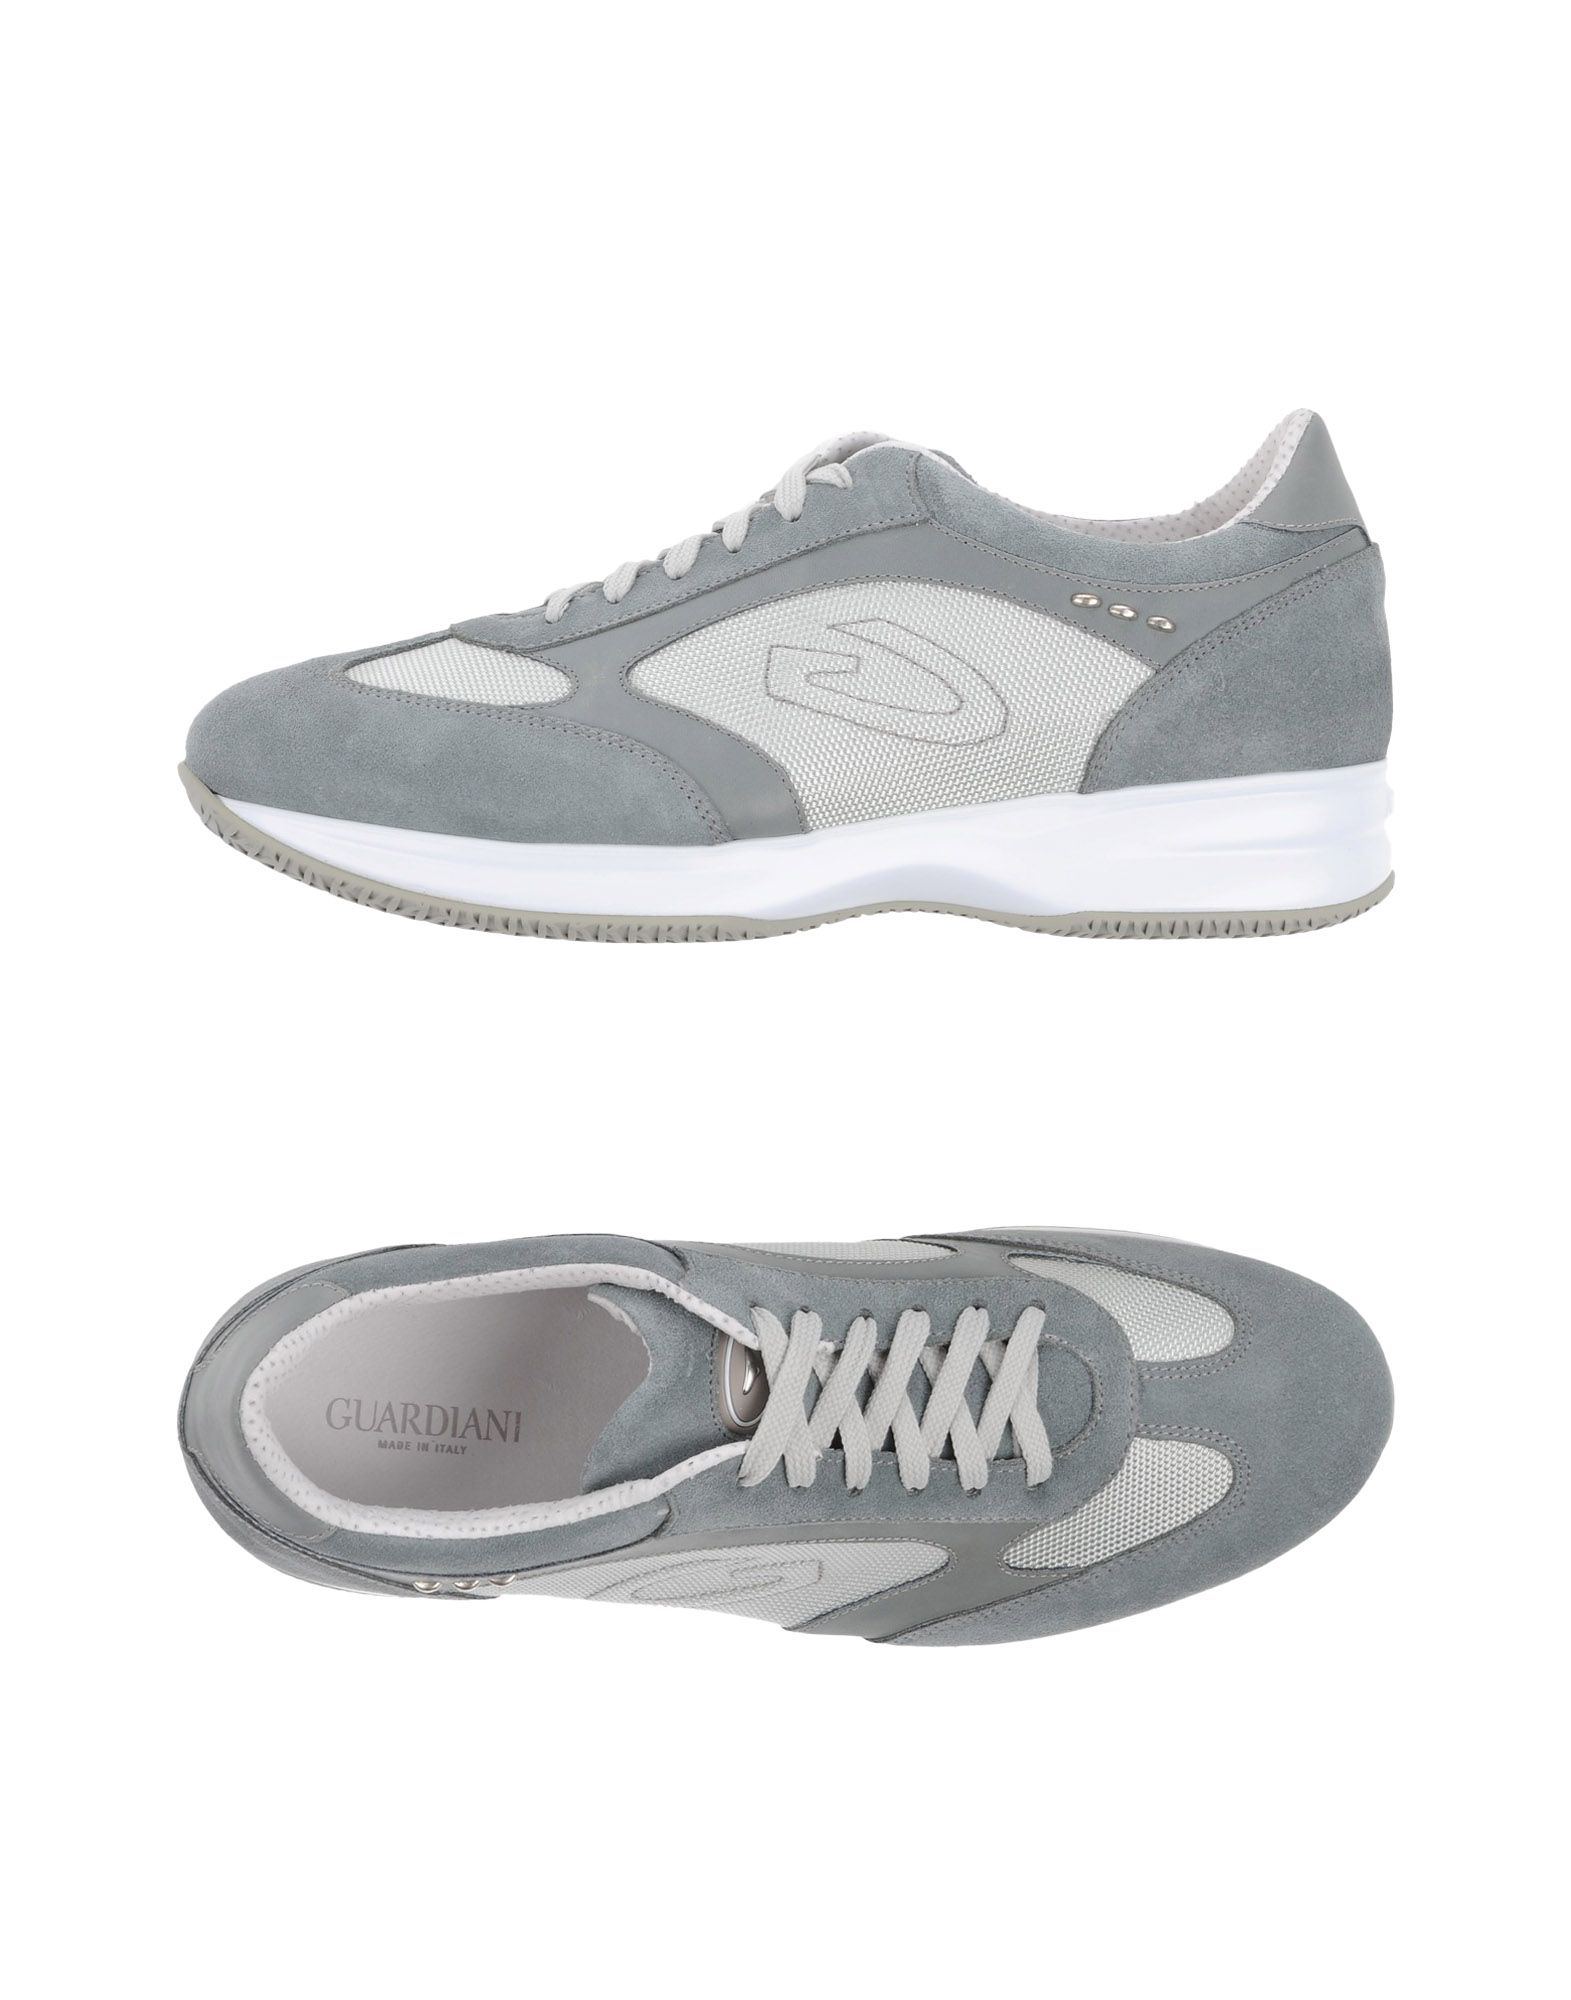 Alberto Guardiani Sneakers Herren  11253536VL Gute Gute 11253536VL Qualität beliebte Schuhe b88f49